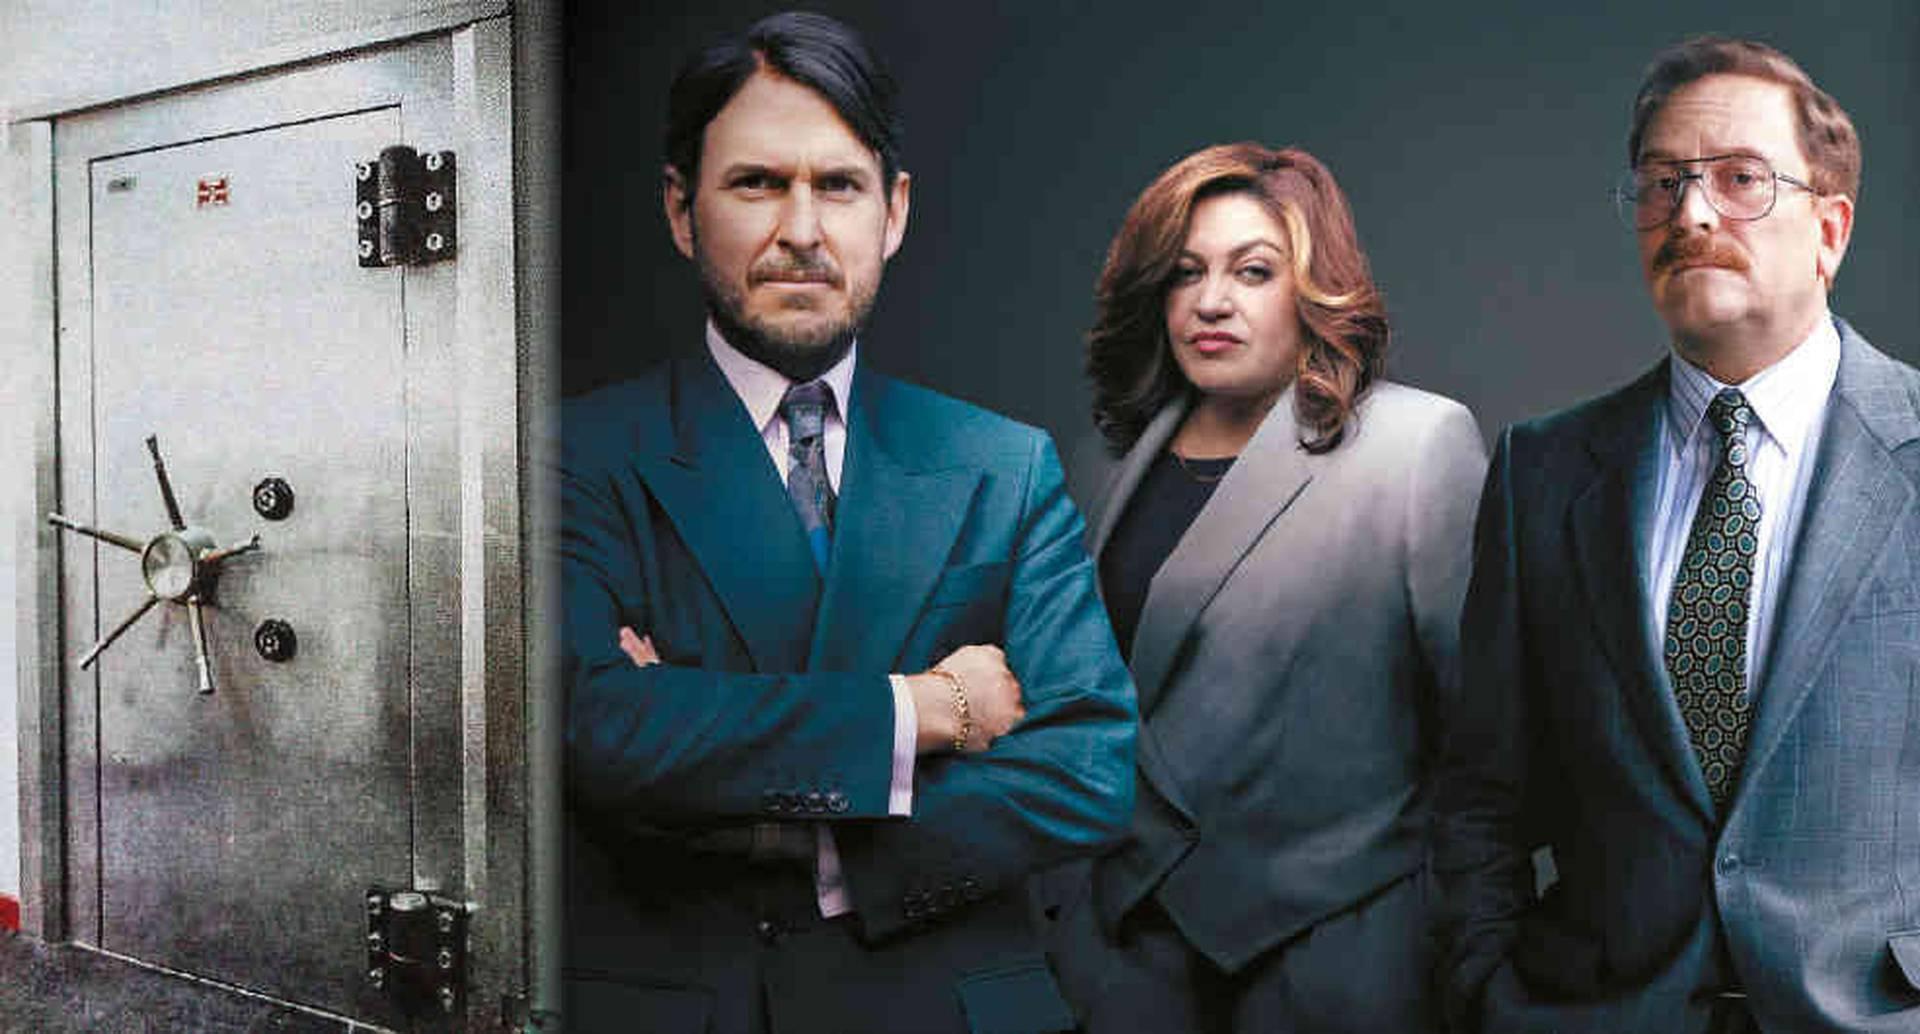 La serie será protagonizada por Andrés Parra, Marcela Benjumea y Christian Tappan.